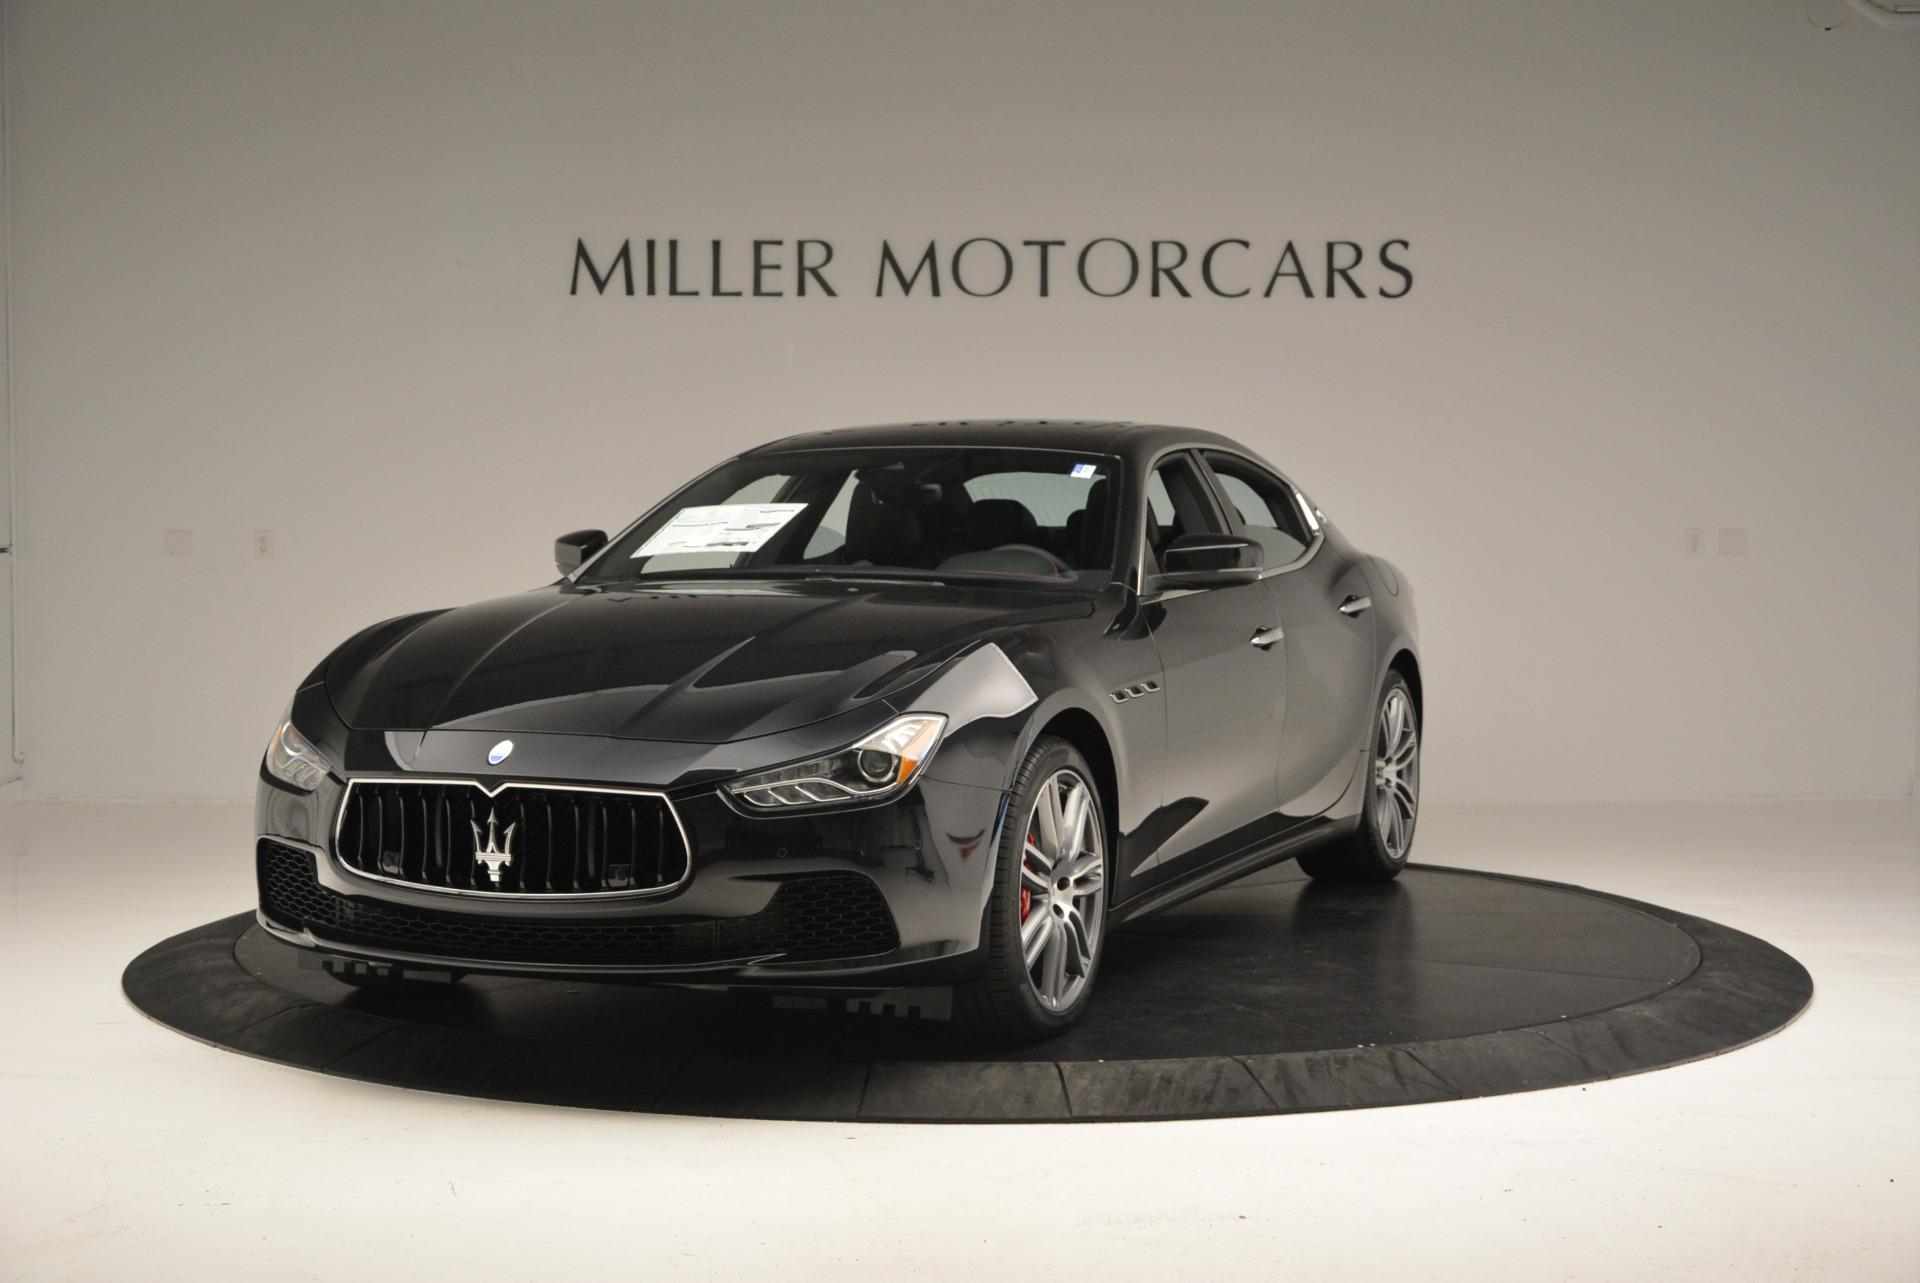 New 2017 Maserati Ghibli S Q4 For Sale In Greenwich, CT 605_main